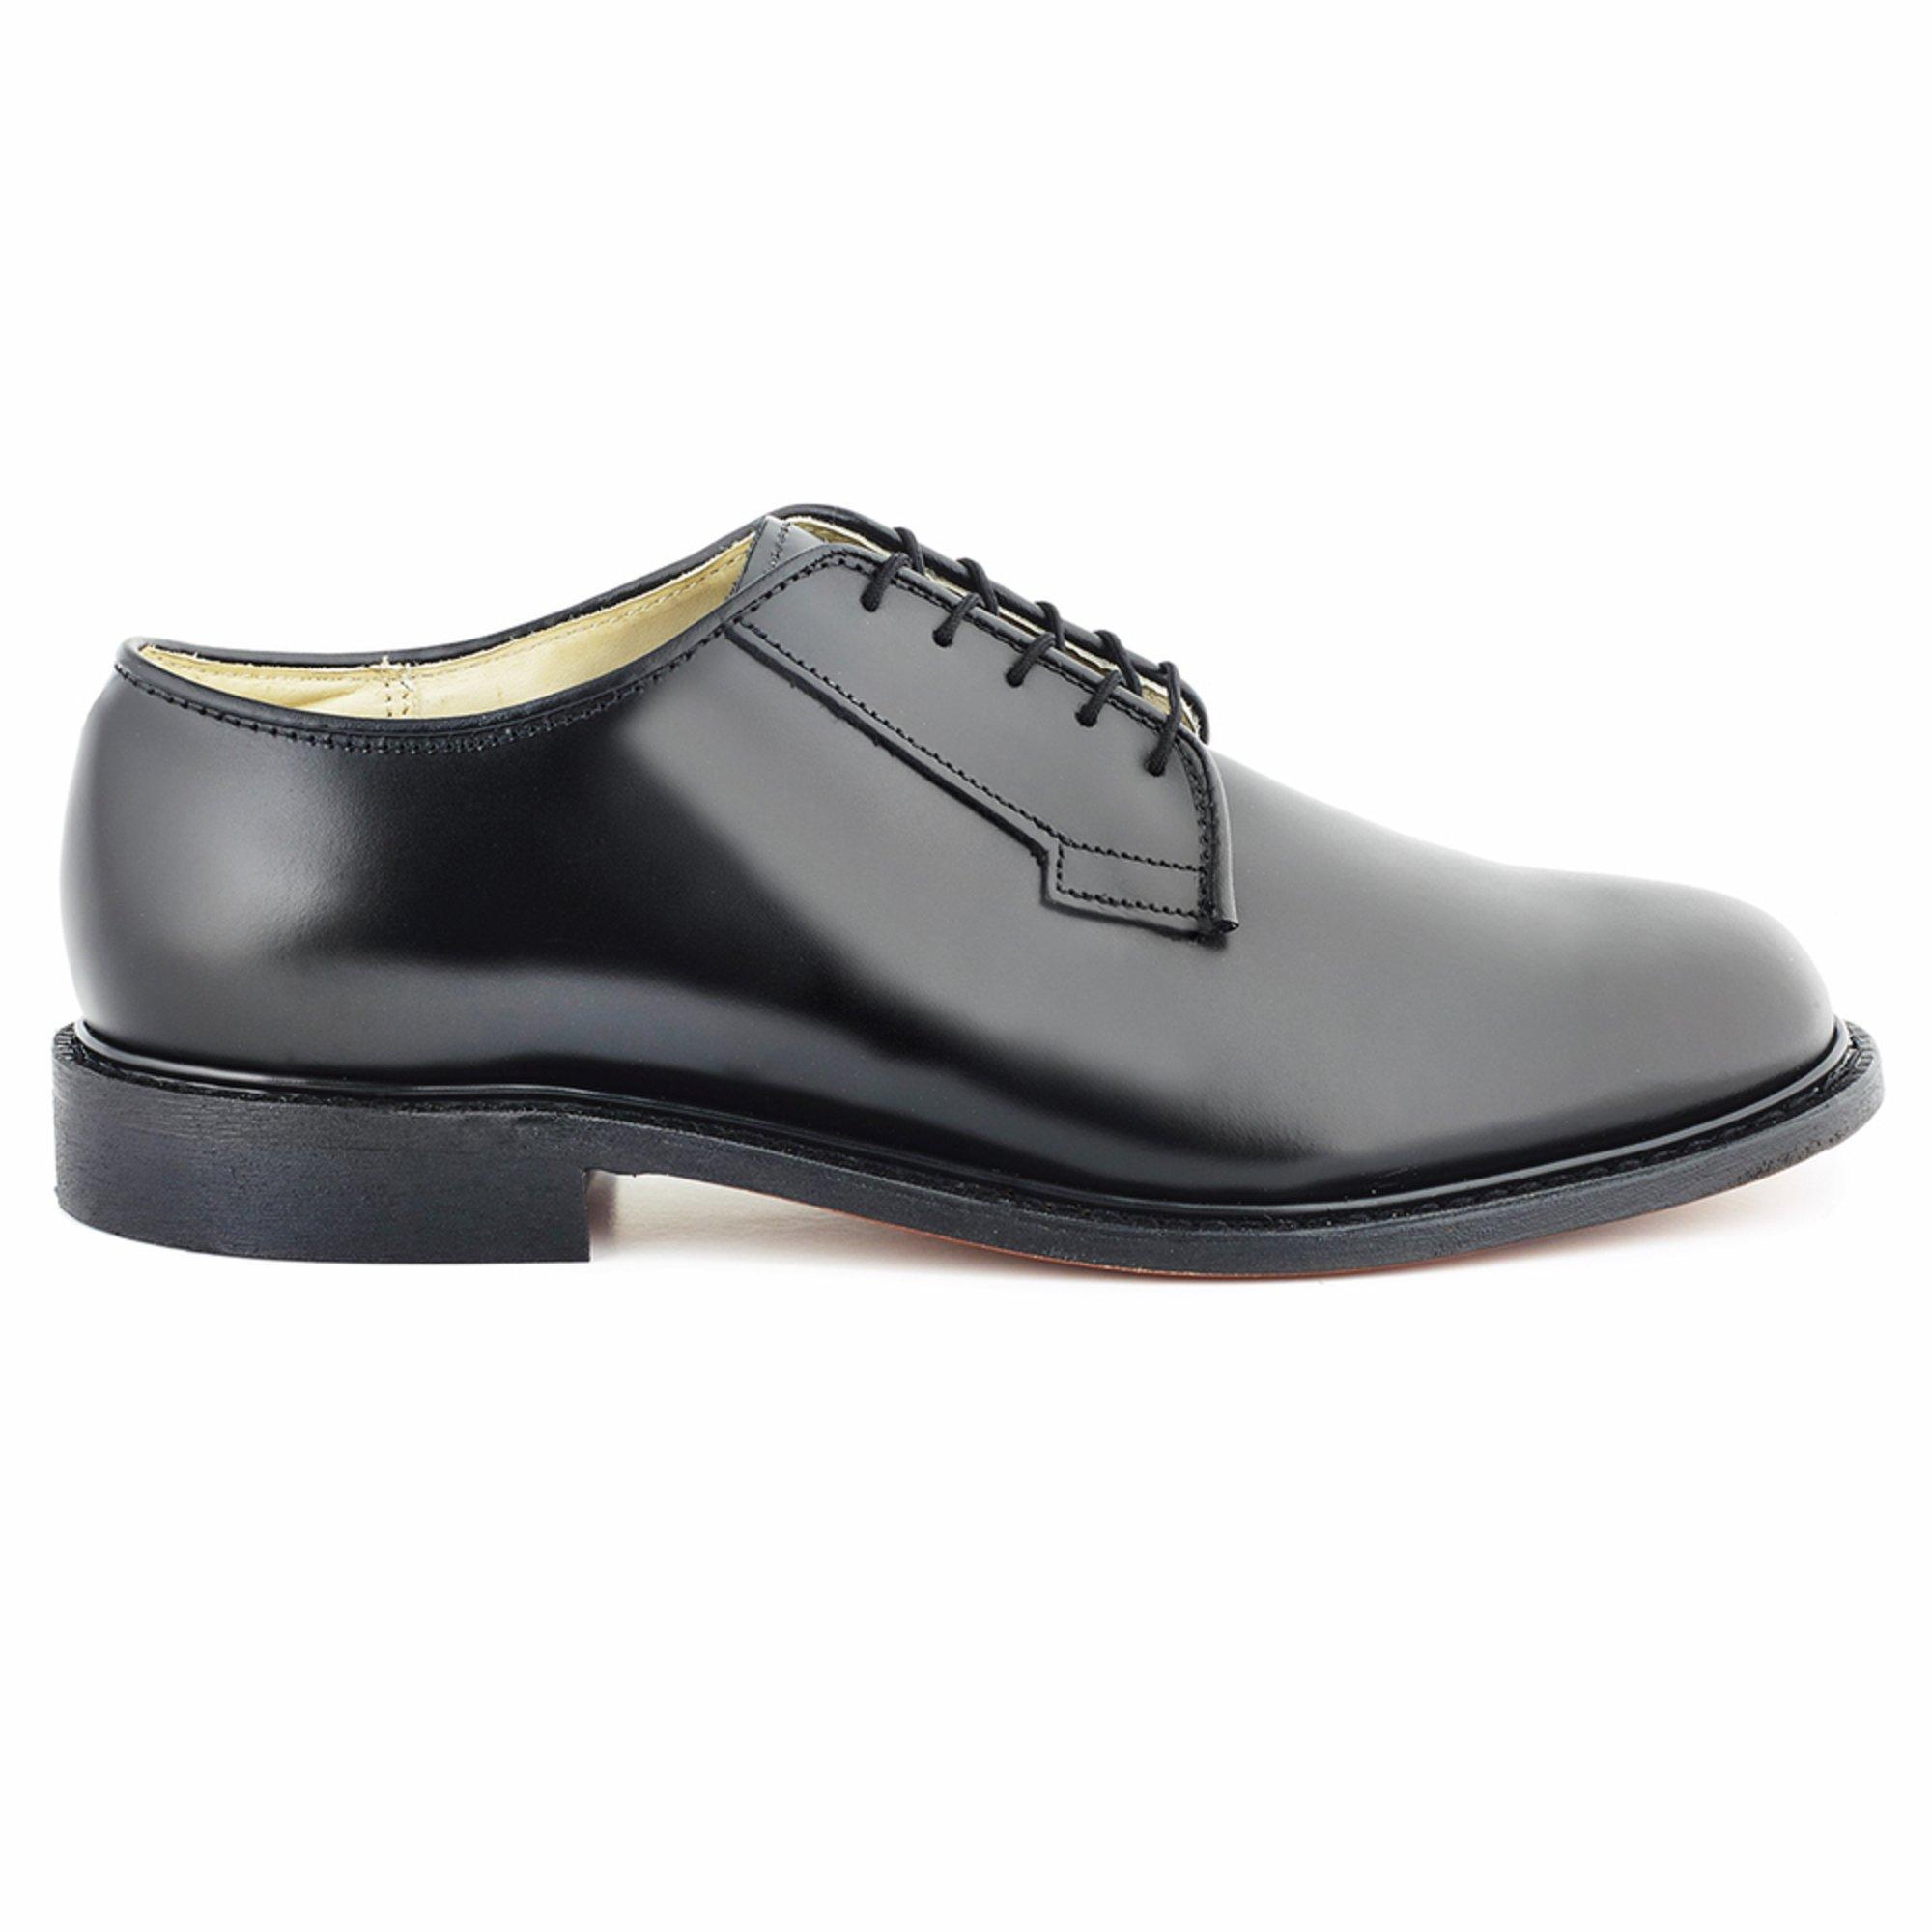 Bates Womens Navy Premier Oxford Uniform Dress Shoe Shoes Uniform Dress  Shoes